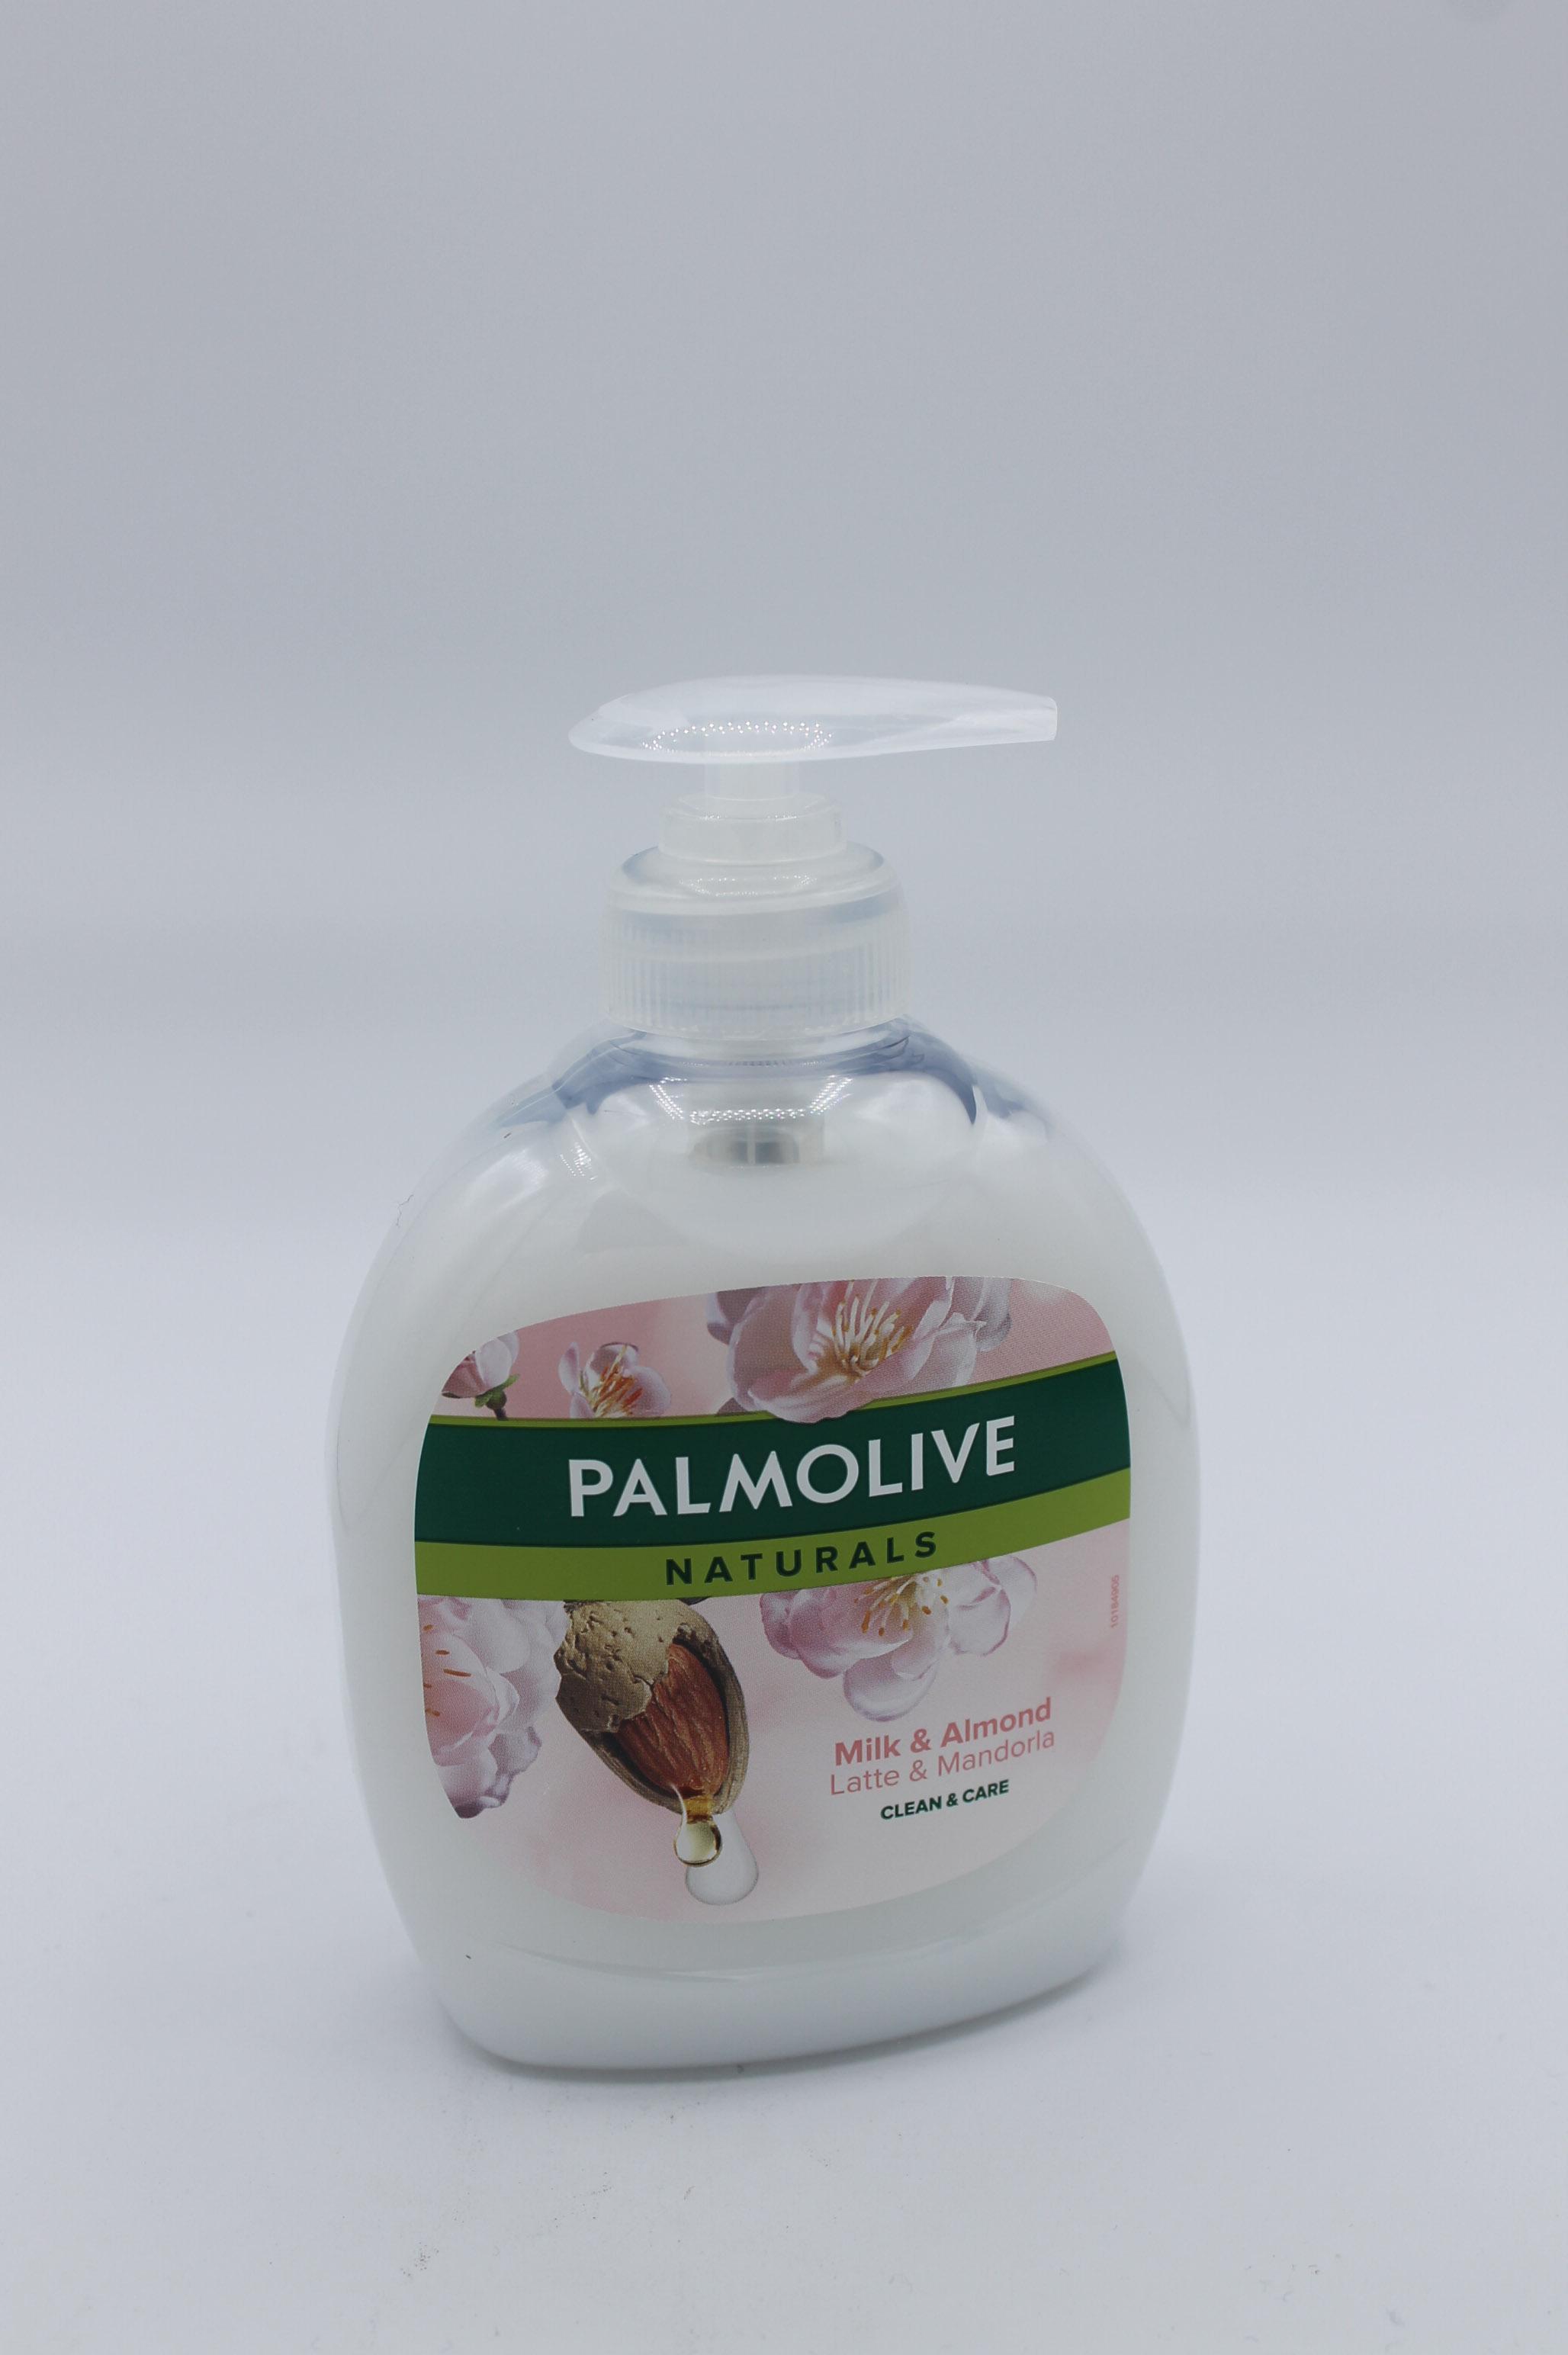 Palmolive sapone liquido latte e mandorla 300ml.